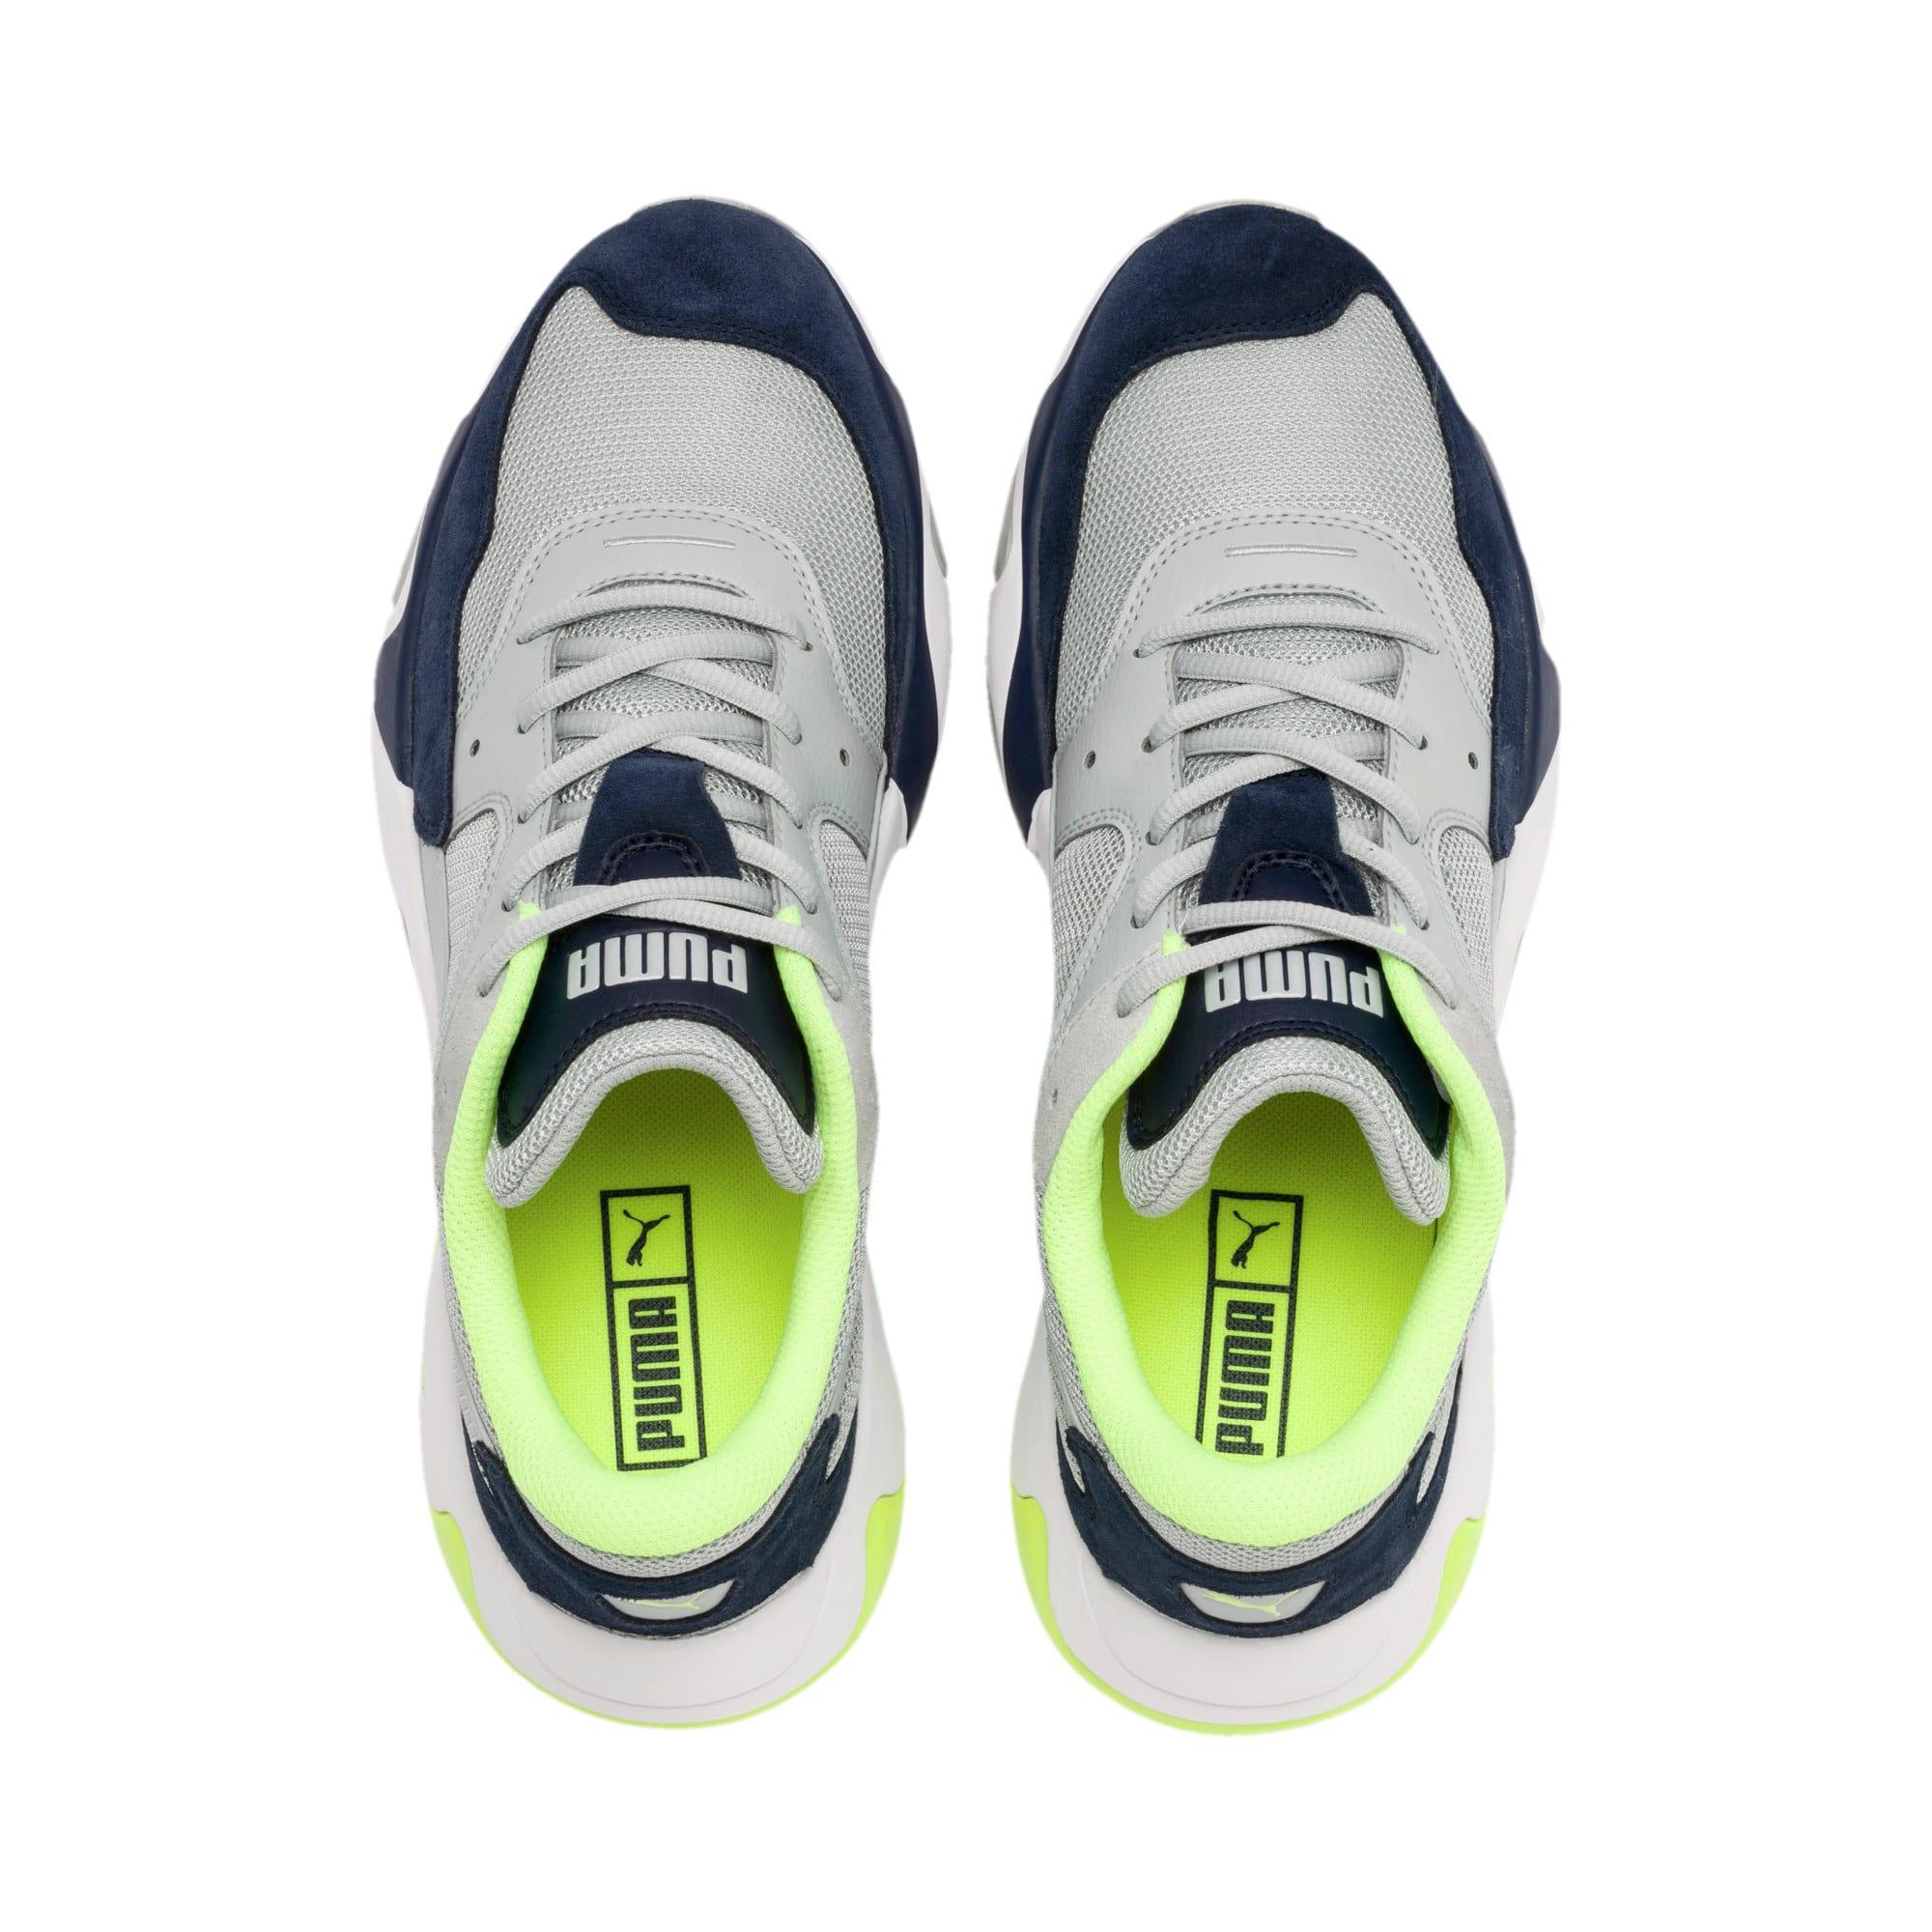 Thumbnail 9 of Storm Adrenaline Sneakers, Peacoat-High Rise, medium